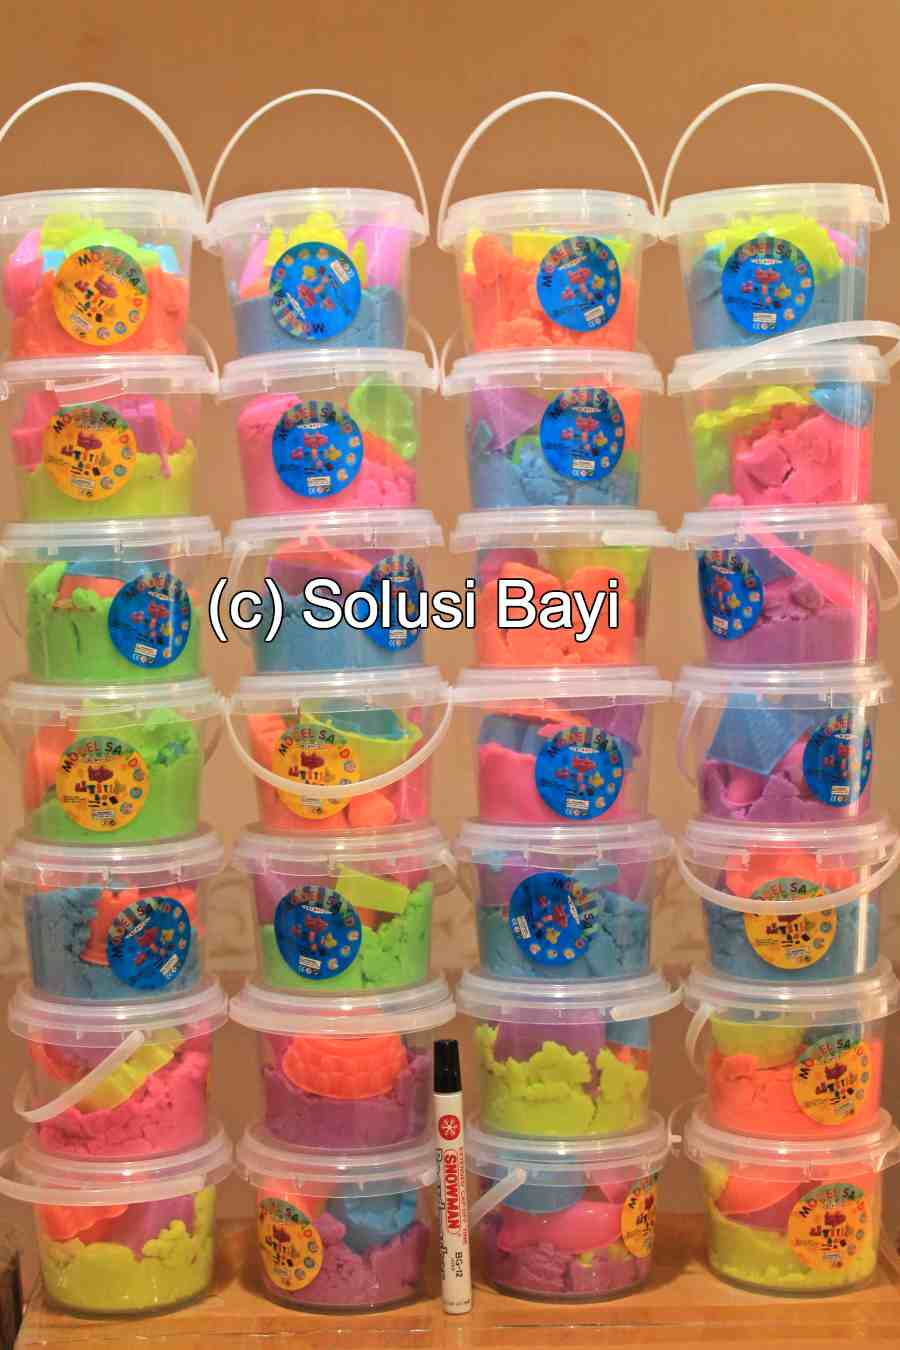 jual kinetic sand pasir kinetik playsand mainan edukatif anak www.solusibayi.com 1 tag